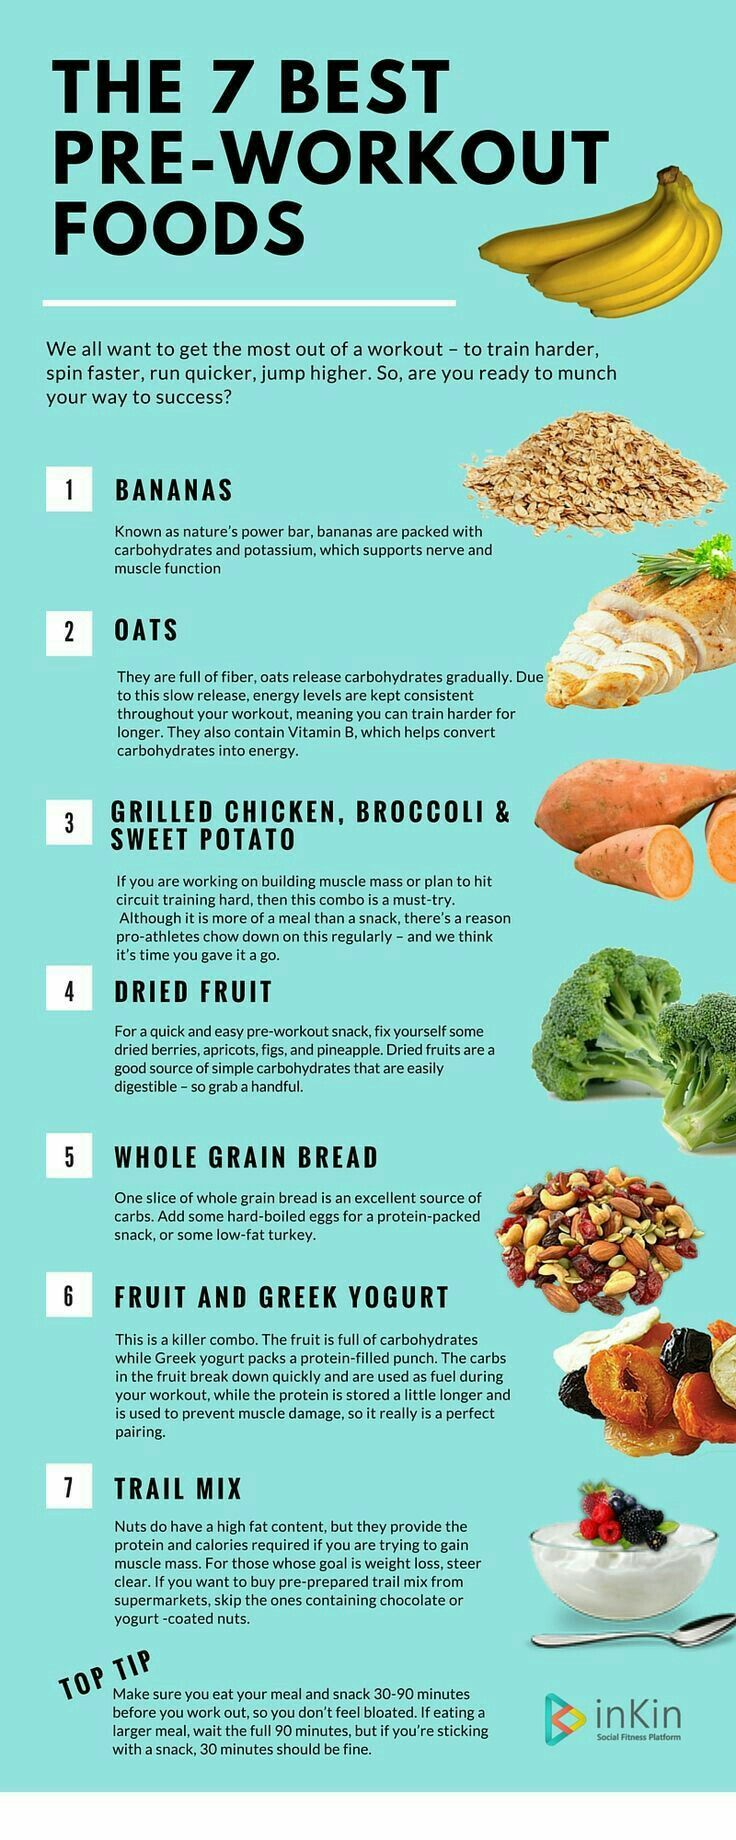 Pre Workout Foods Best Pre Workout Food Pre Workout Food Workout Food